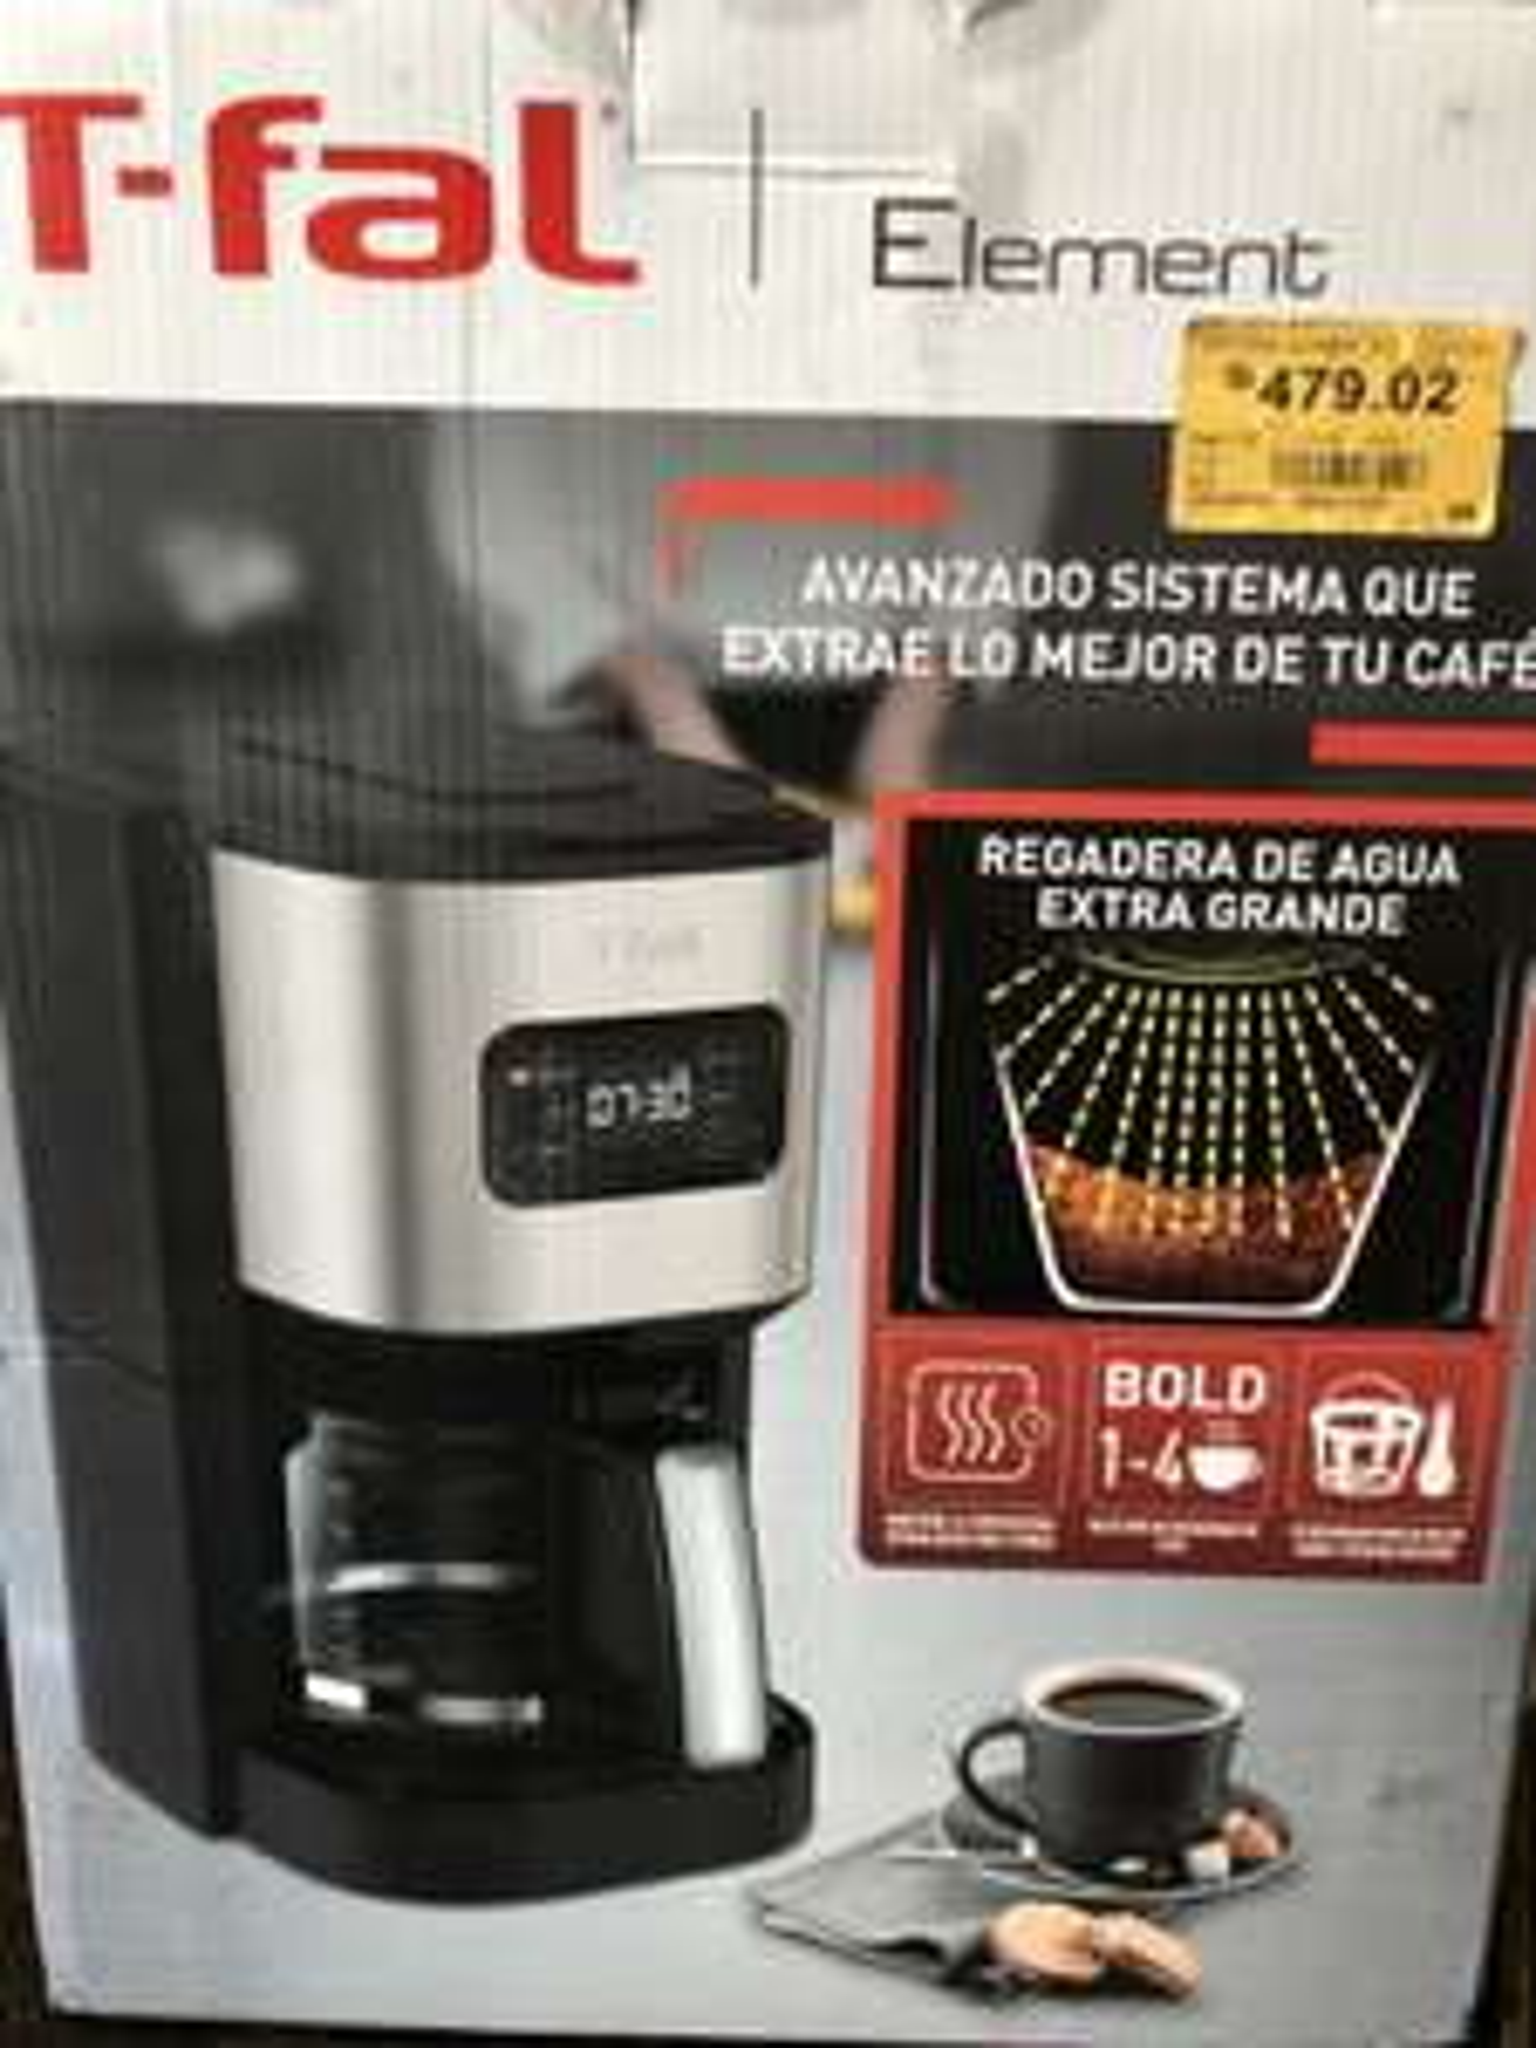 Cafetera T-fal. Superama Villahermosa, Tabasco